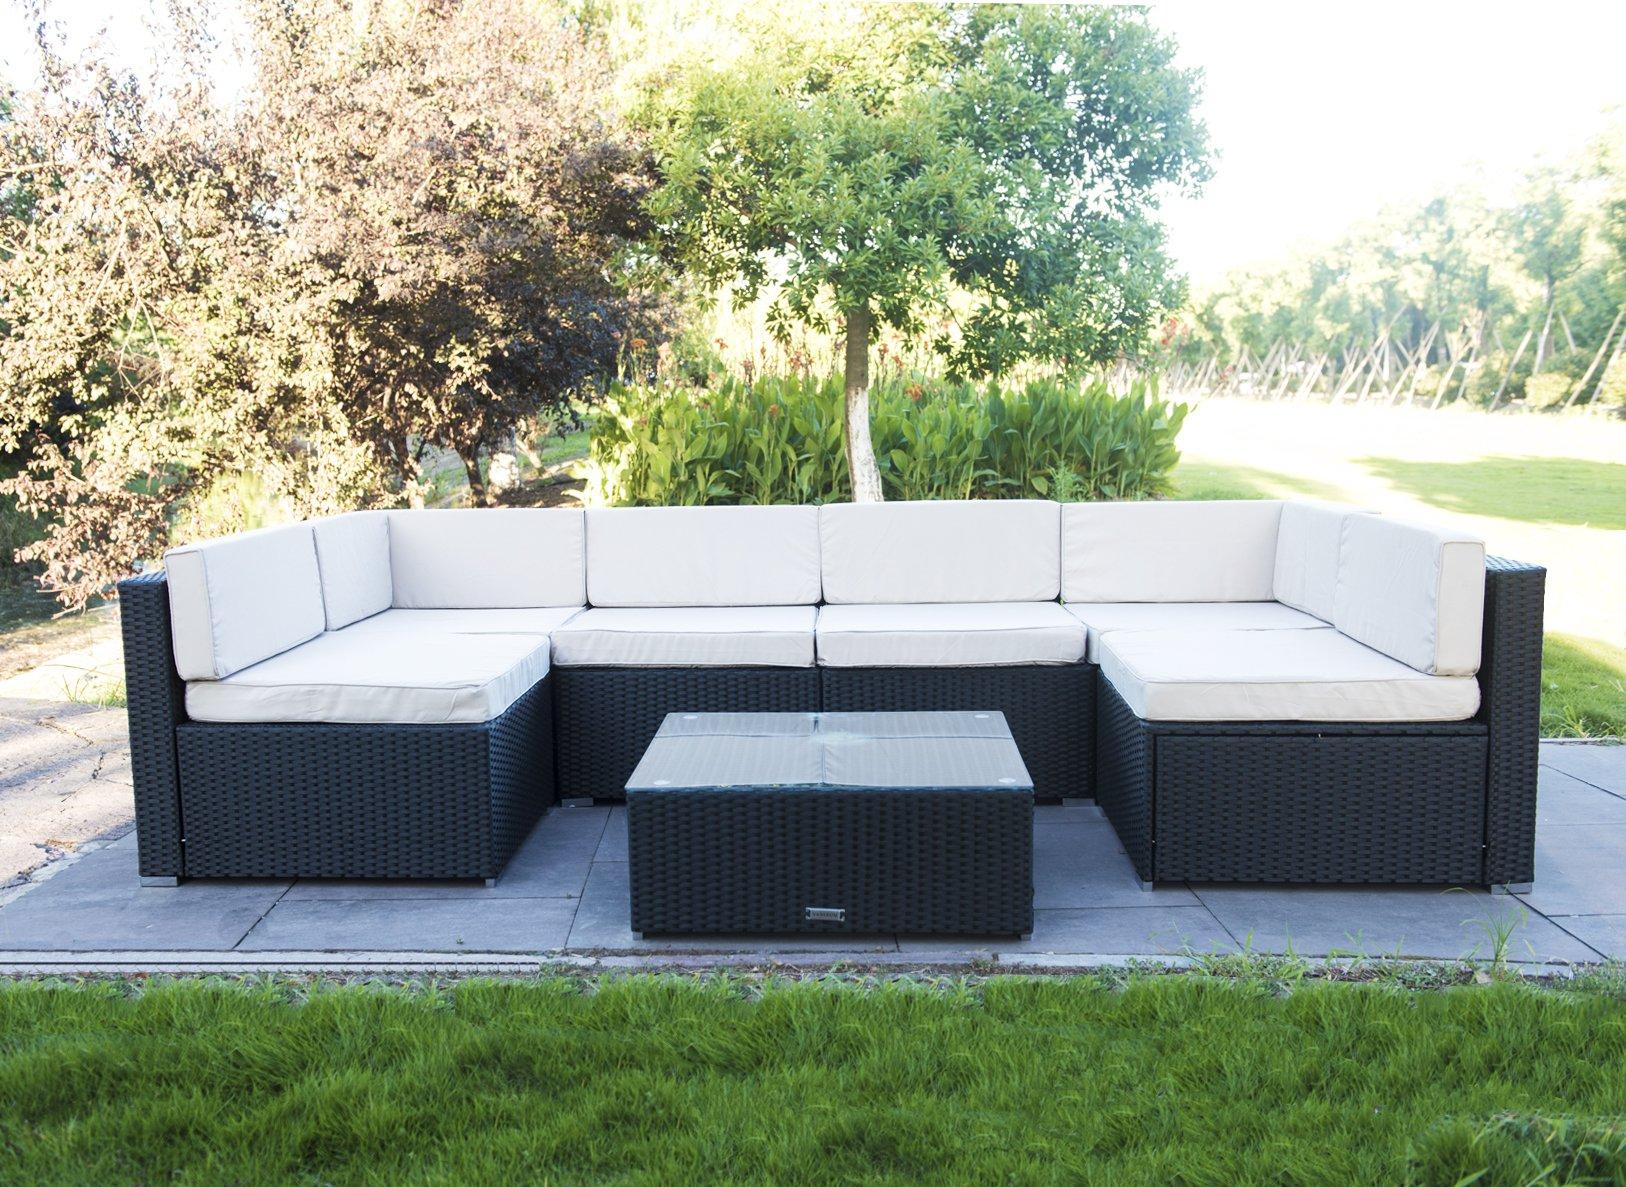 VANERUM 7 Piece Outdoor Patio PE Rattan Wicker Sofa Sectional Furniture Set (Black)   for Patio,Backyard,Deck,Pool   Incl.Tan Cushions & Seats